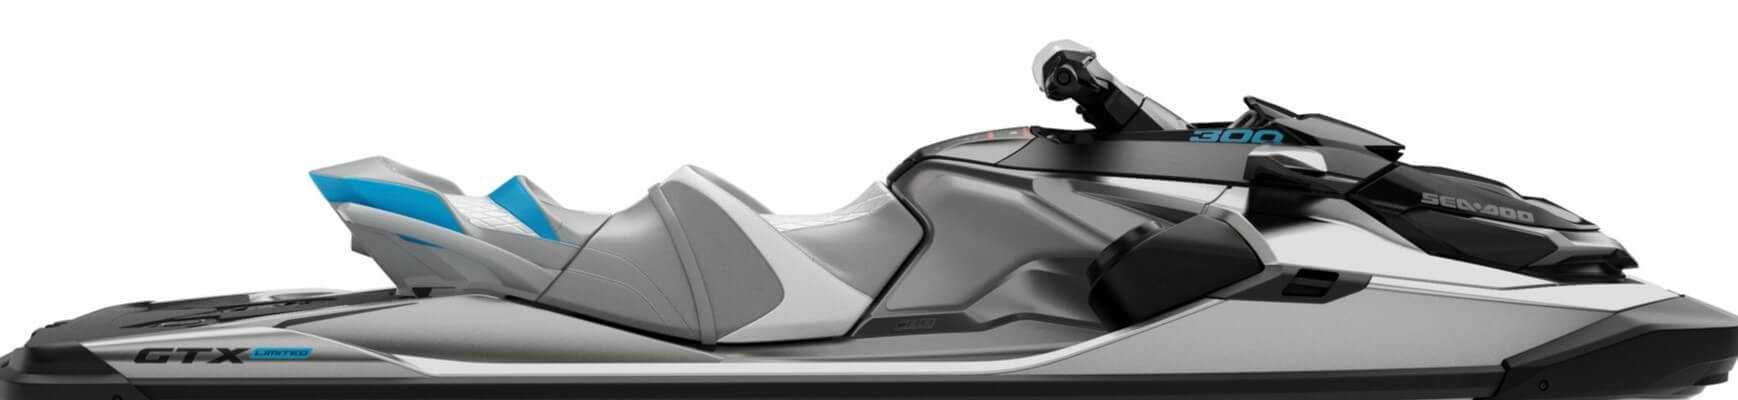 Jetski Touring 2020